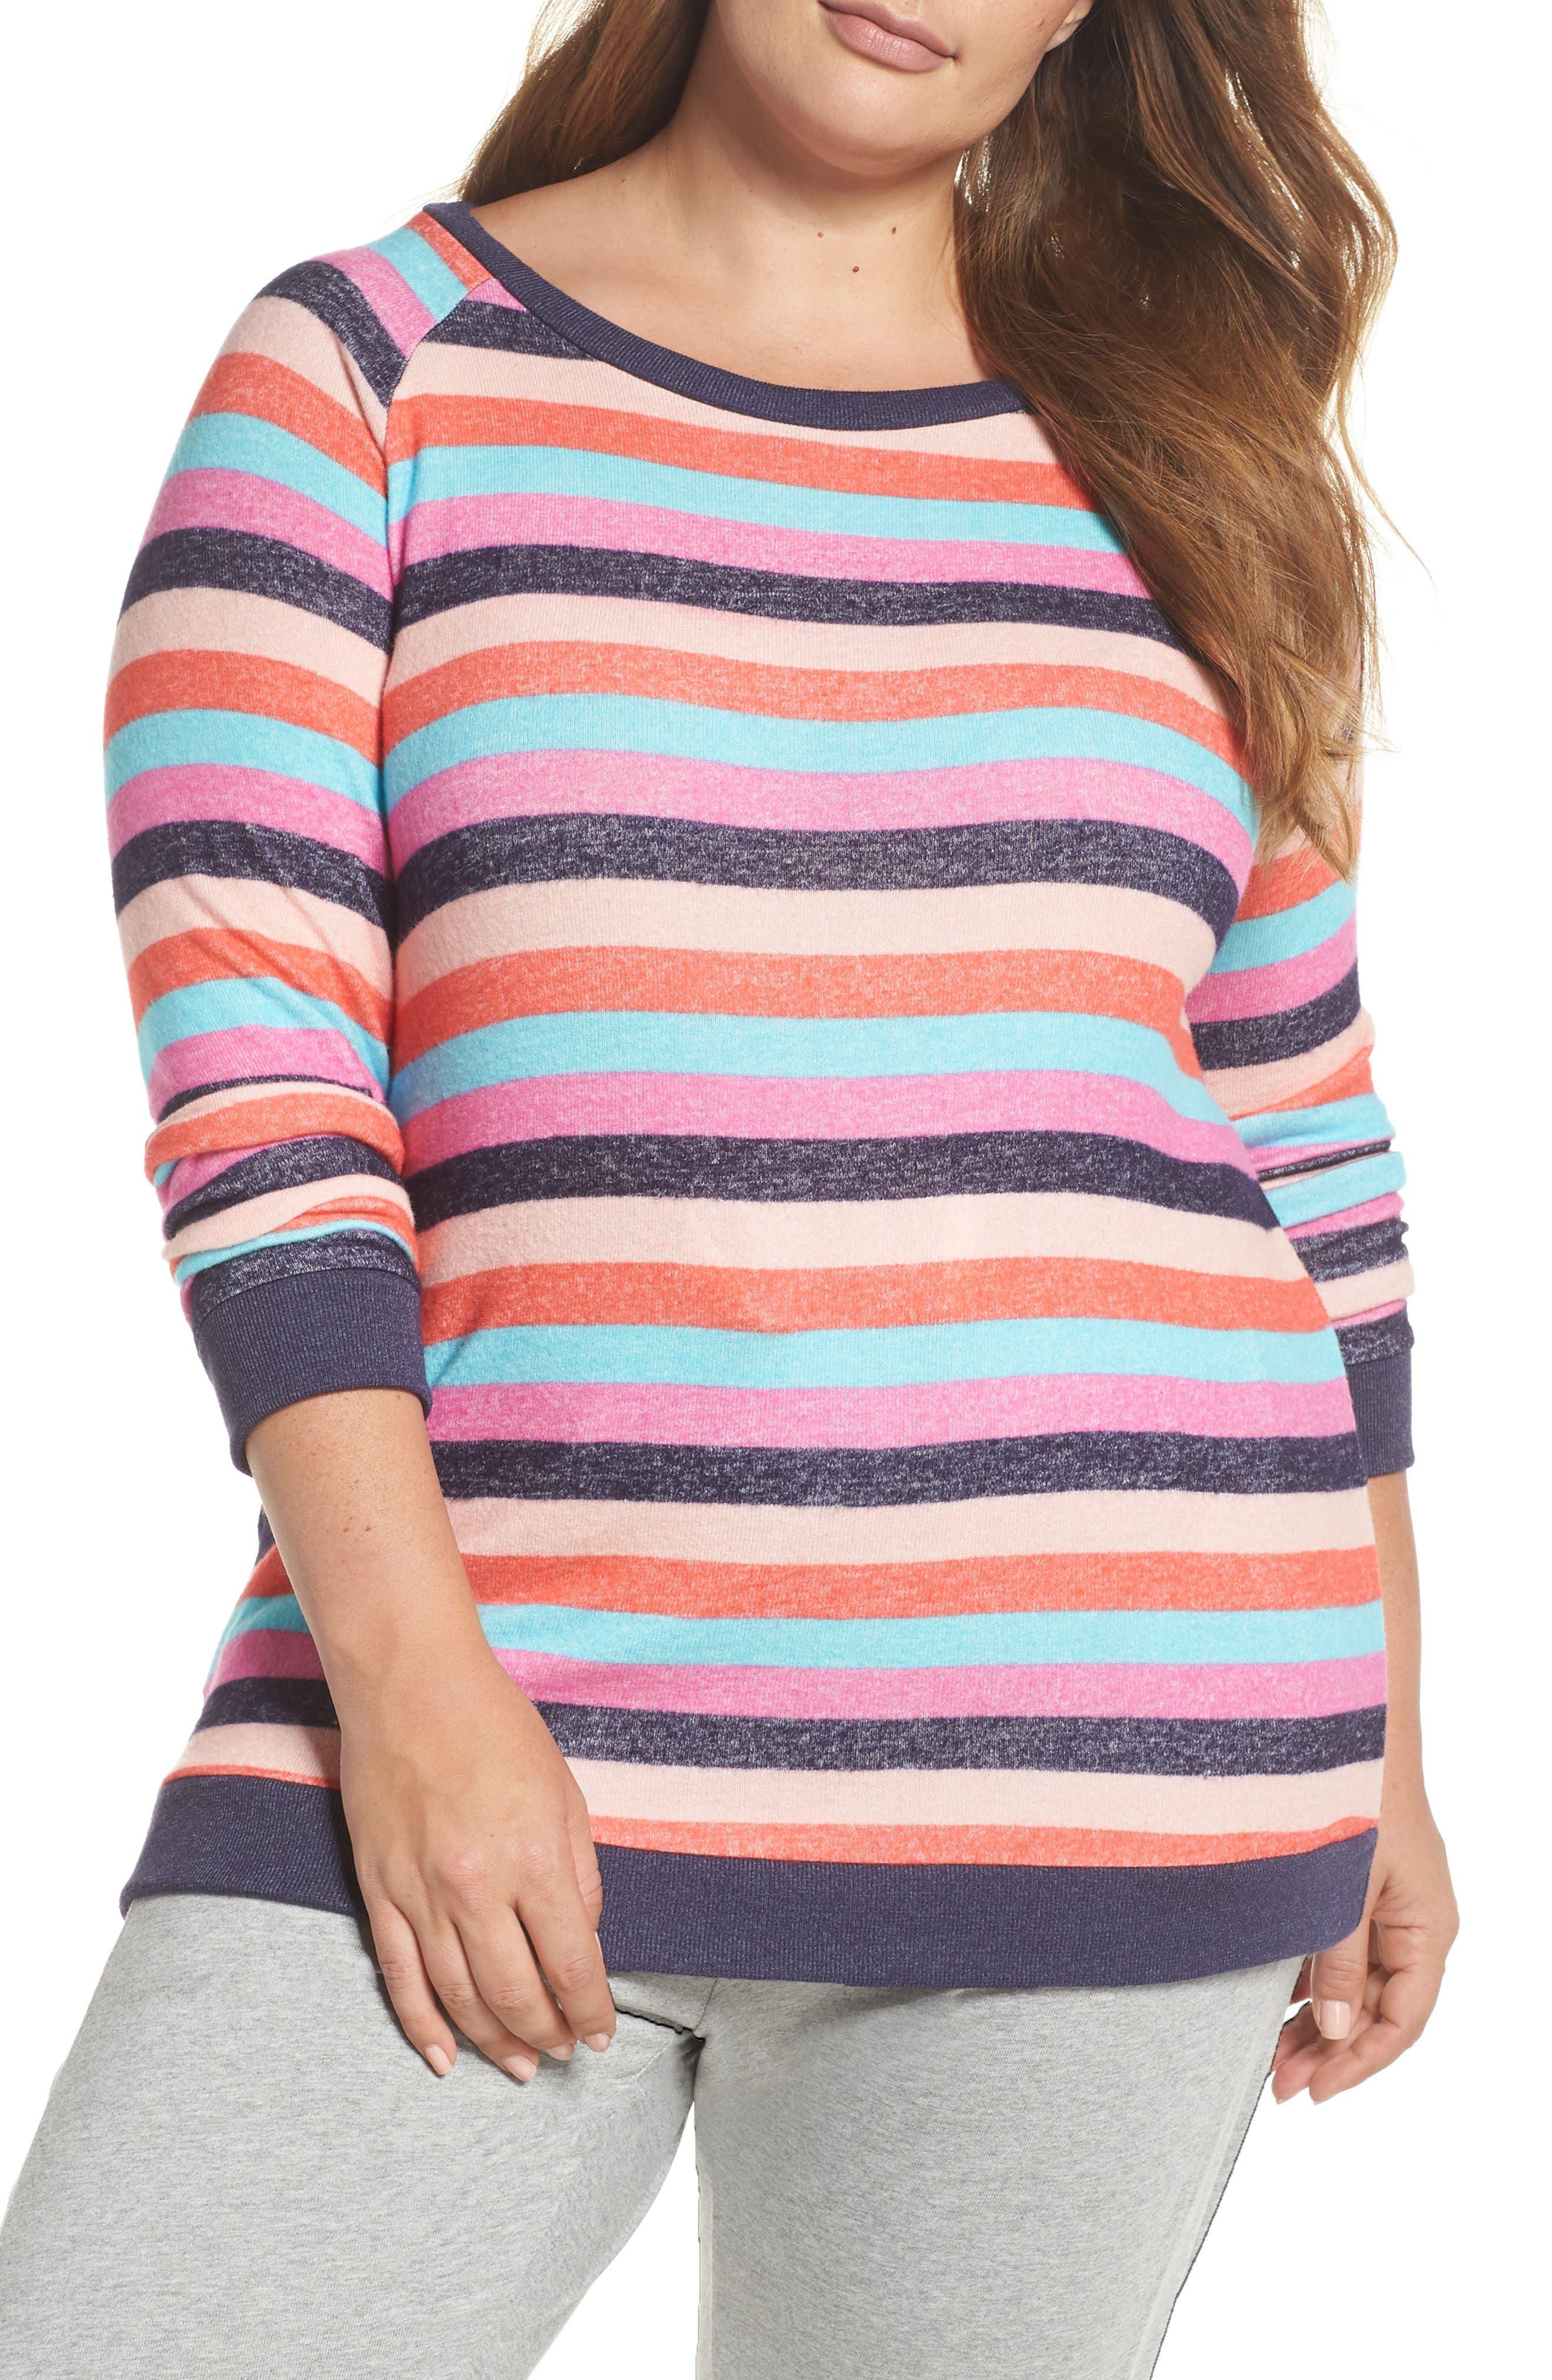 Cozy Crew Lounge Sweater,                         Main,                         color, Navy Dusk Milli Multi Stripe